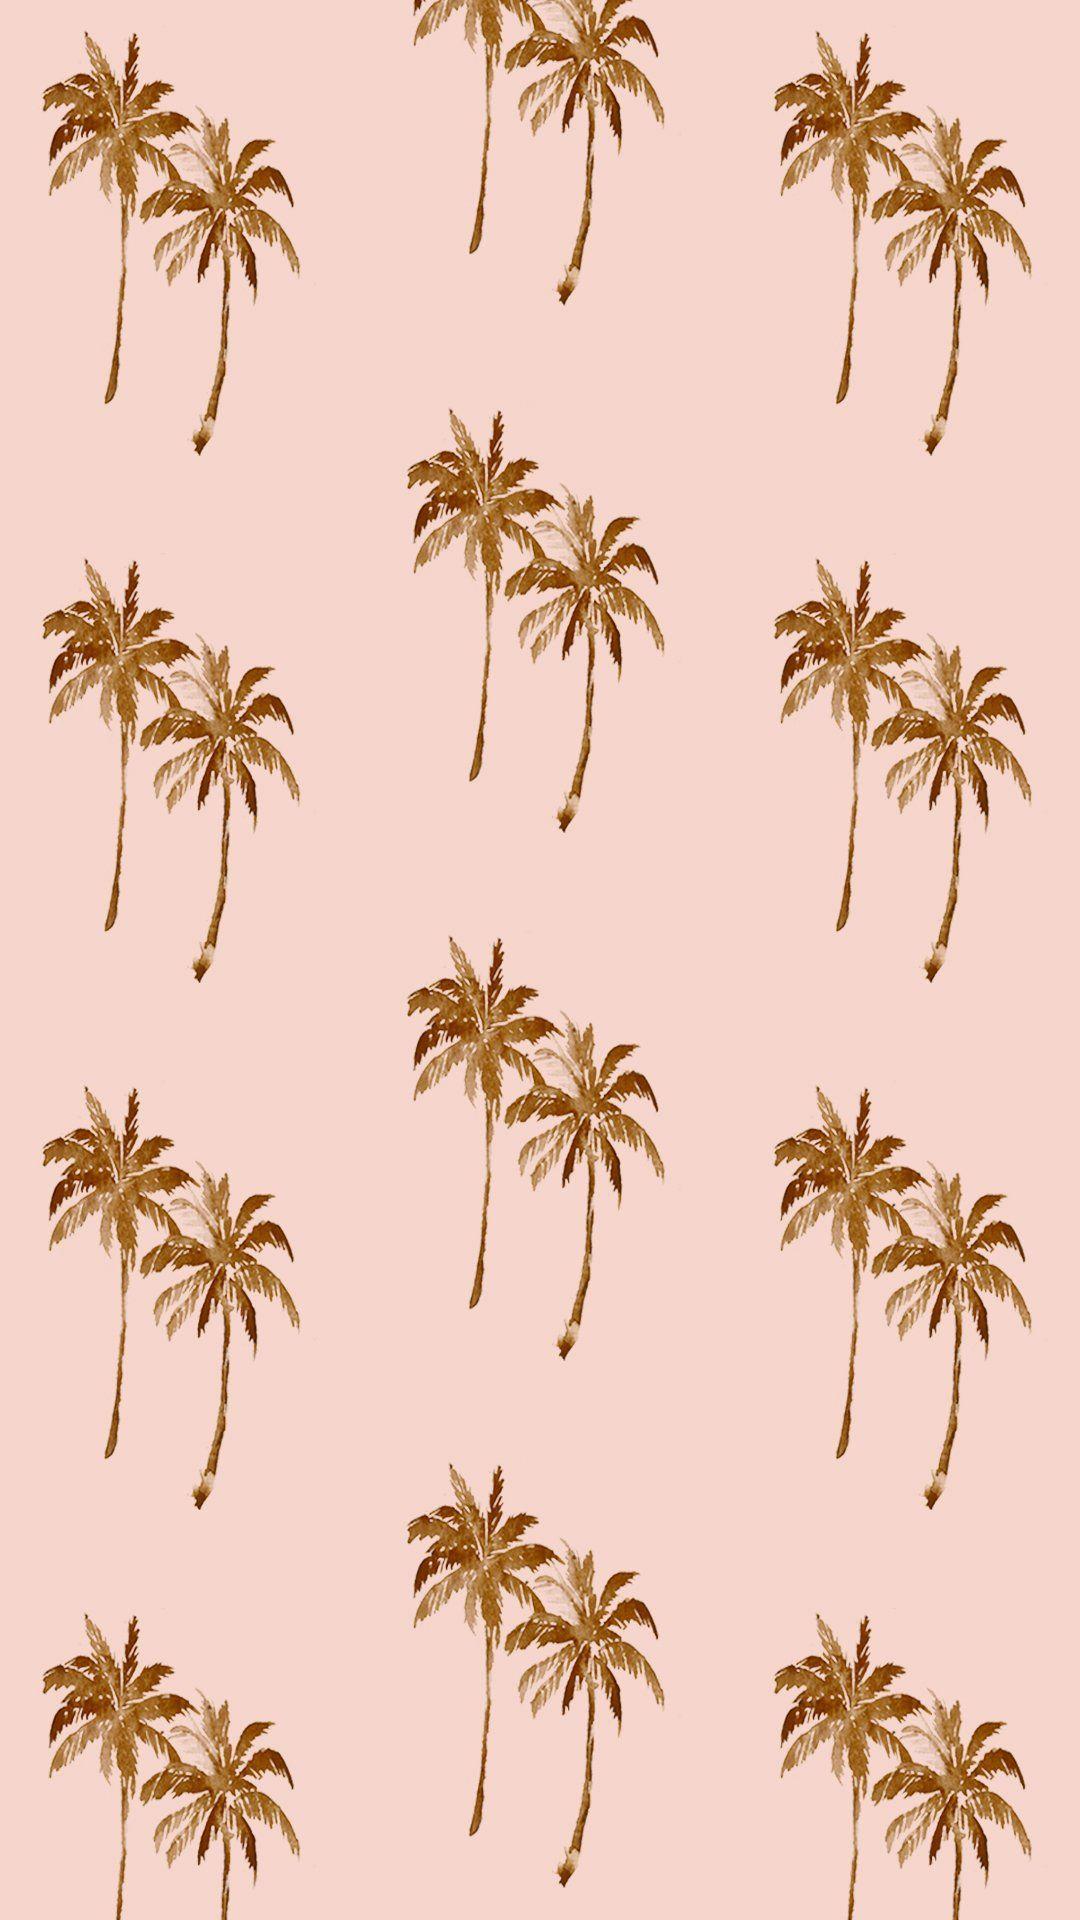 Free Desktop Cell Phone Wallpaper Palm Trees Wallpaper Tree Wallpaper Phone Wallpaper